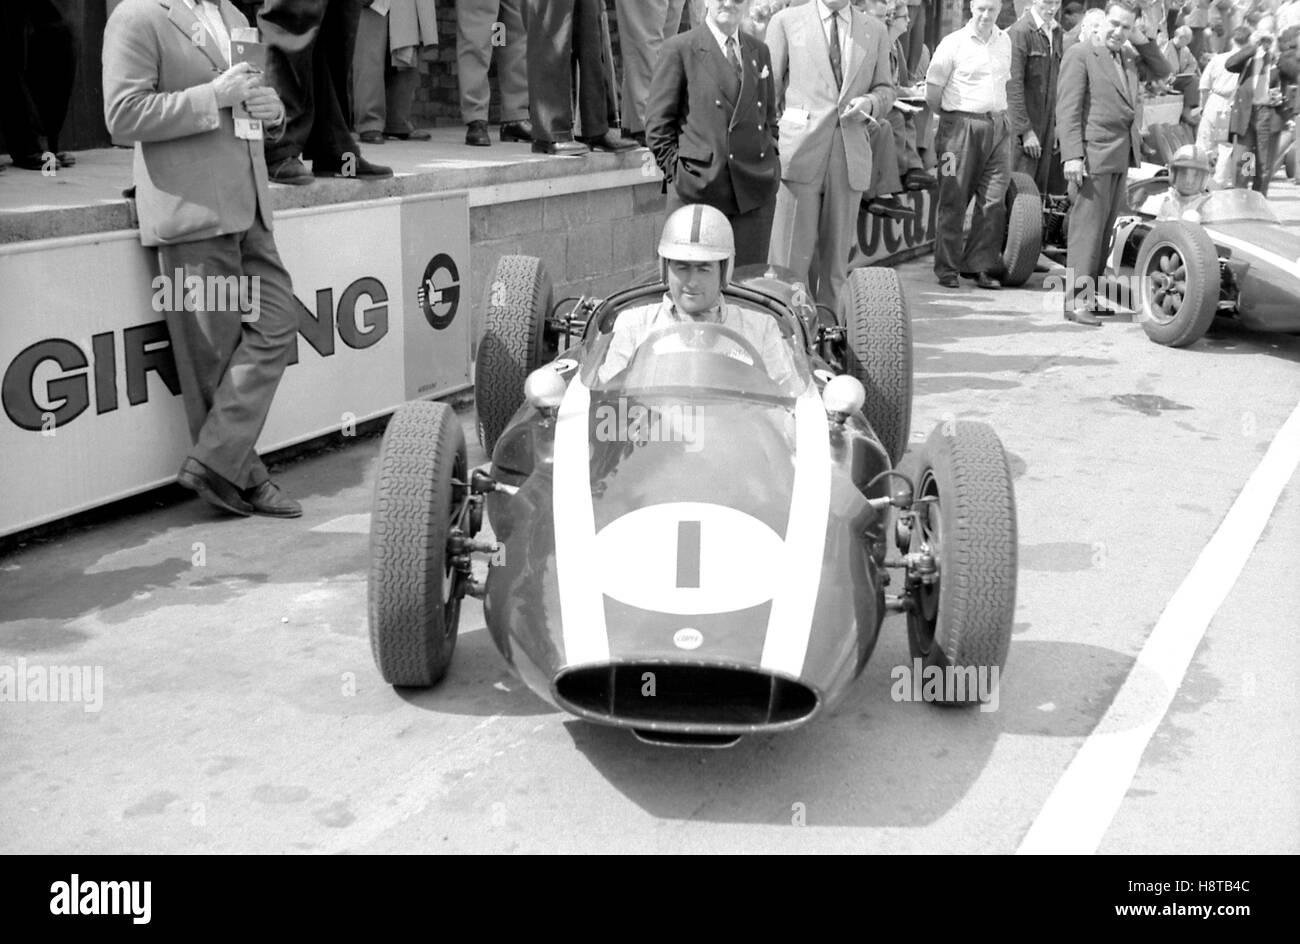 1960 BRITISH GP BRABHAM WORKS COOPER LOWLINE - Stock Image